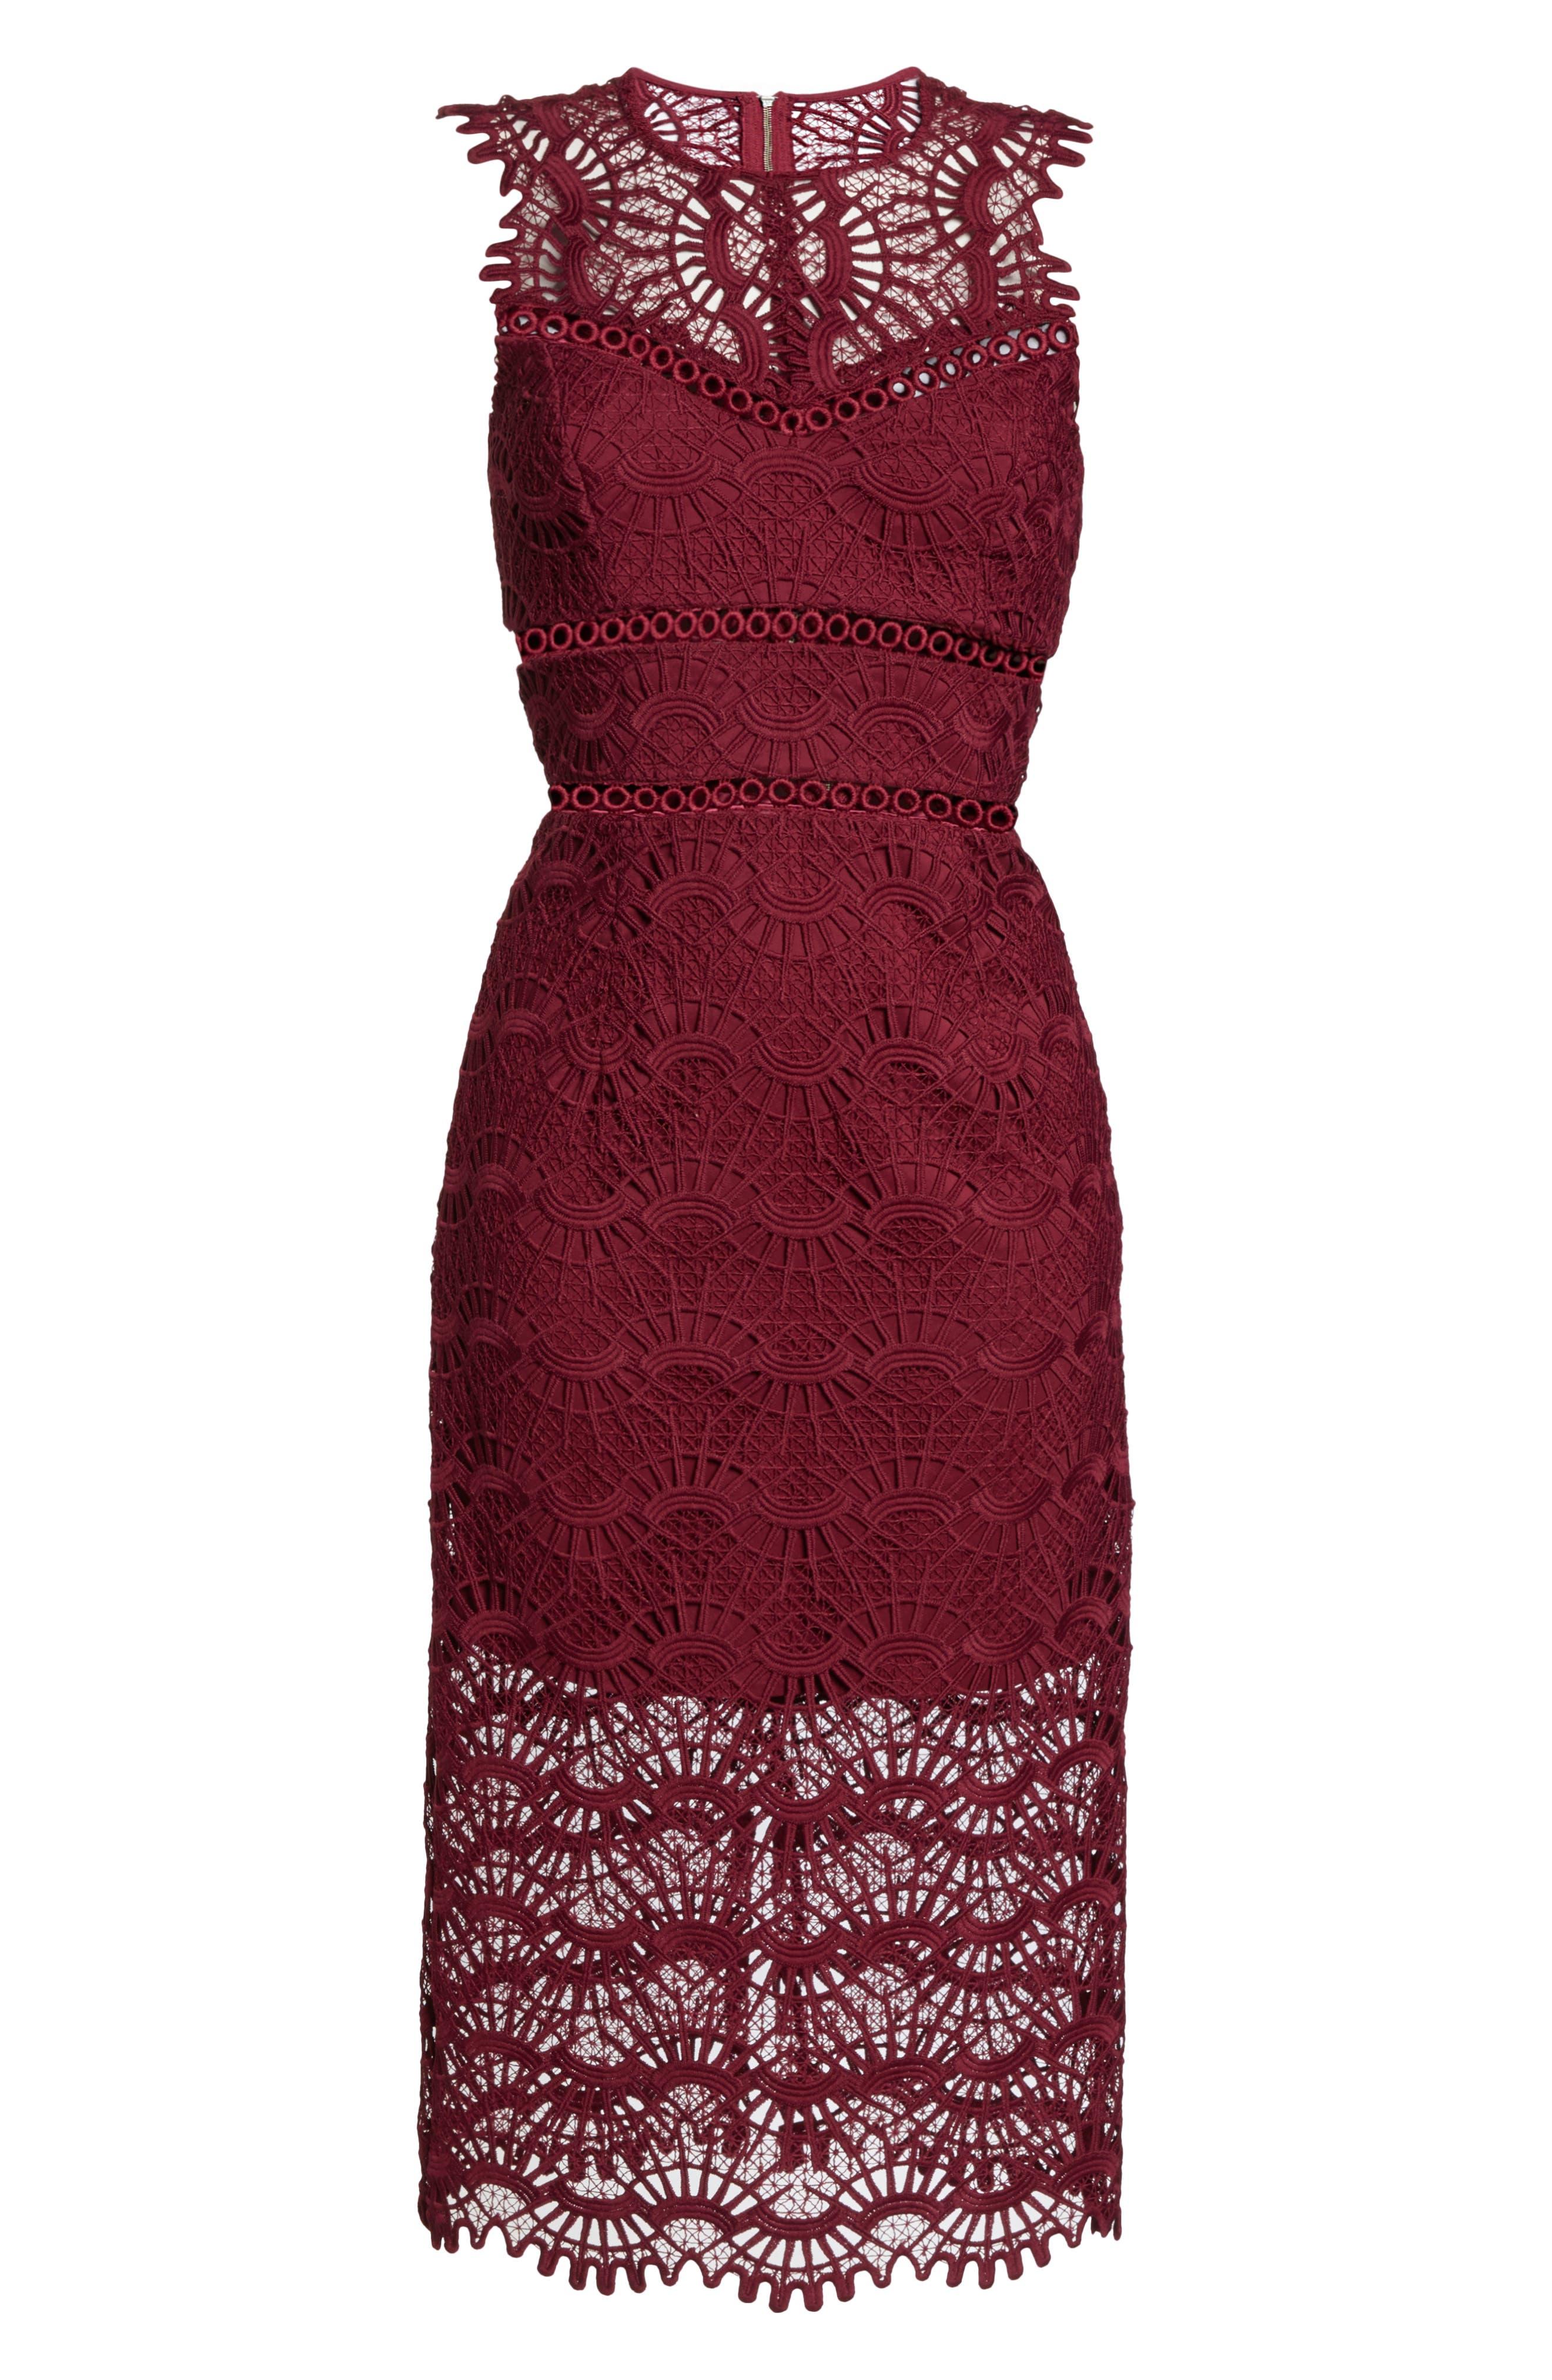 Mariano Lace Sheath Dress,                             Alternate thumbnail 8, color,                             601